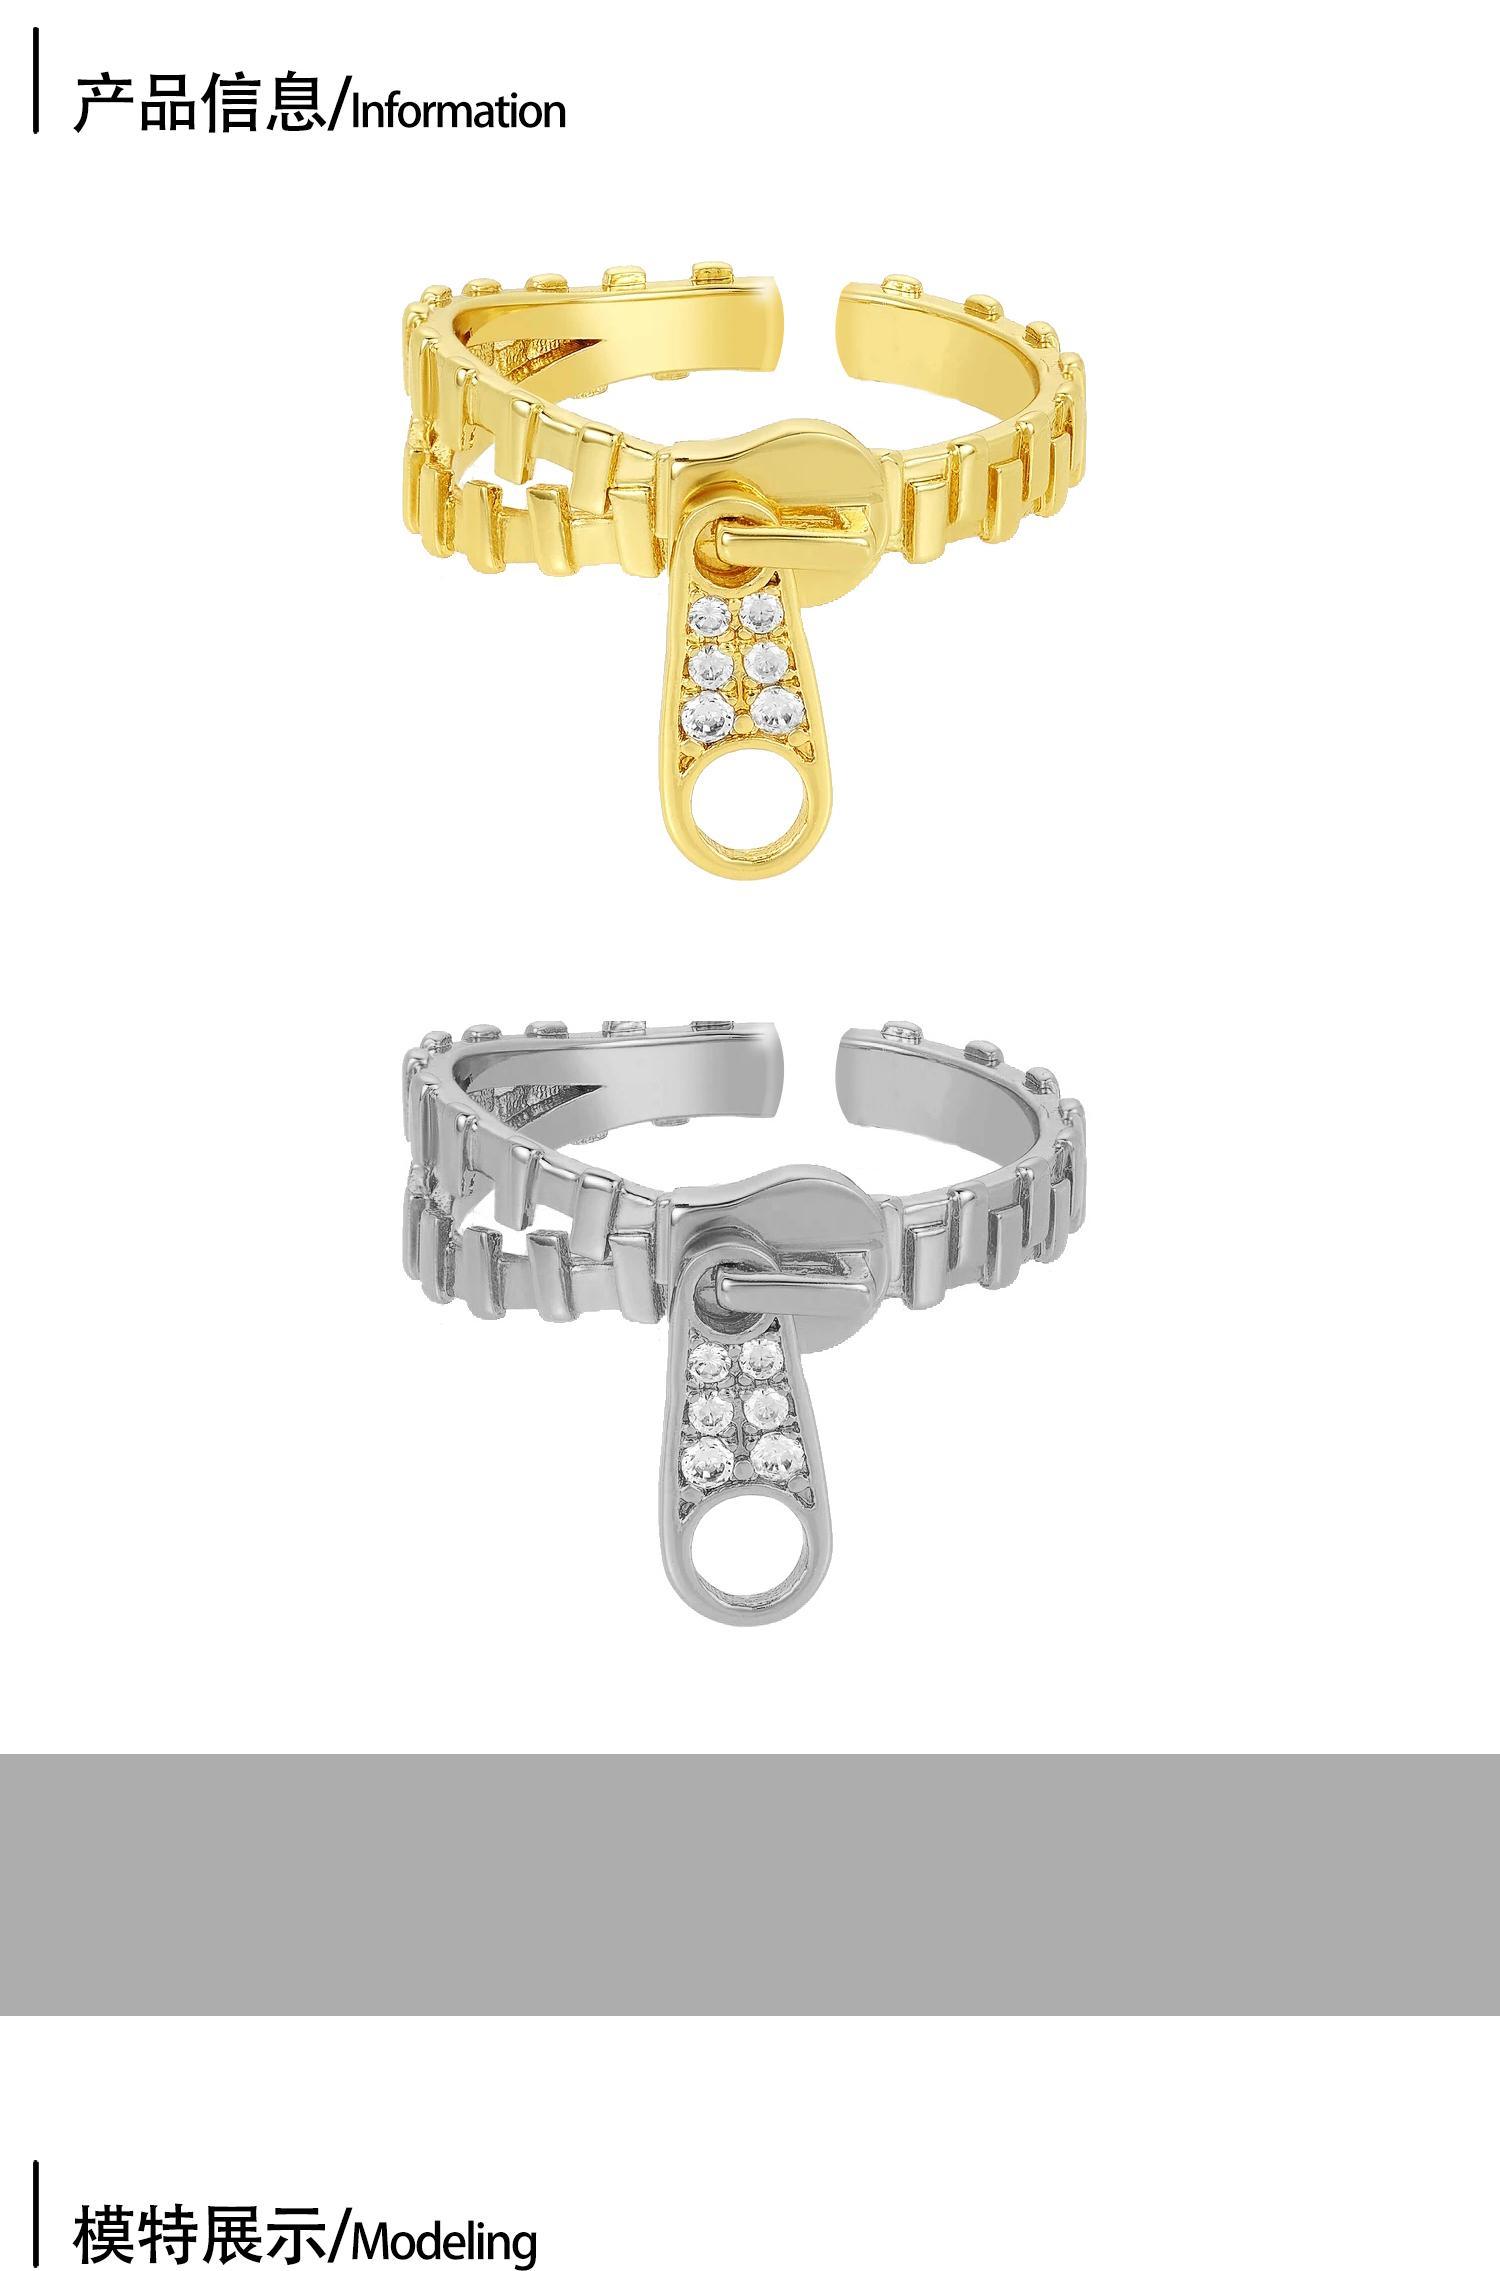 JUNJUN ACCWearring 時尚小眾設計拉環戒指女 復古流蘇鋯石開口可調節指環